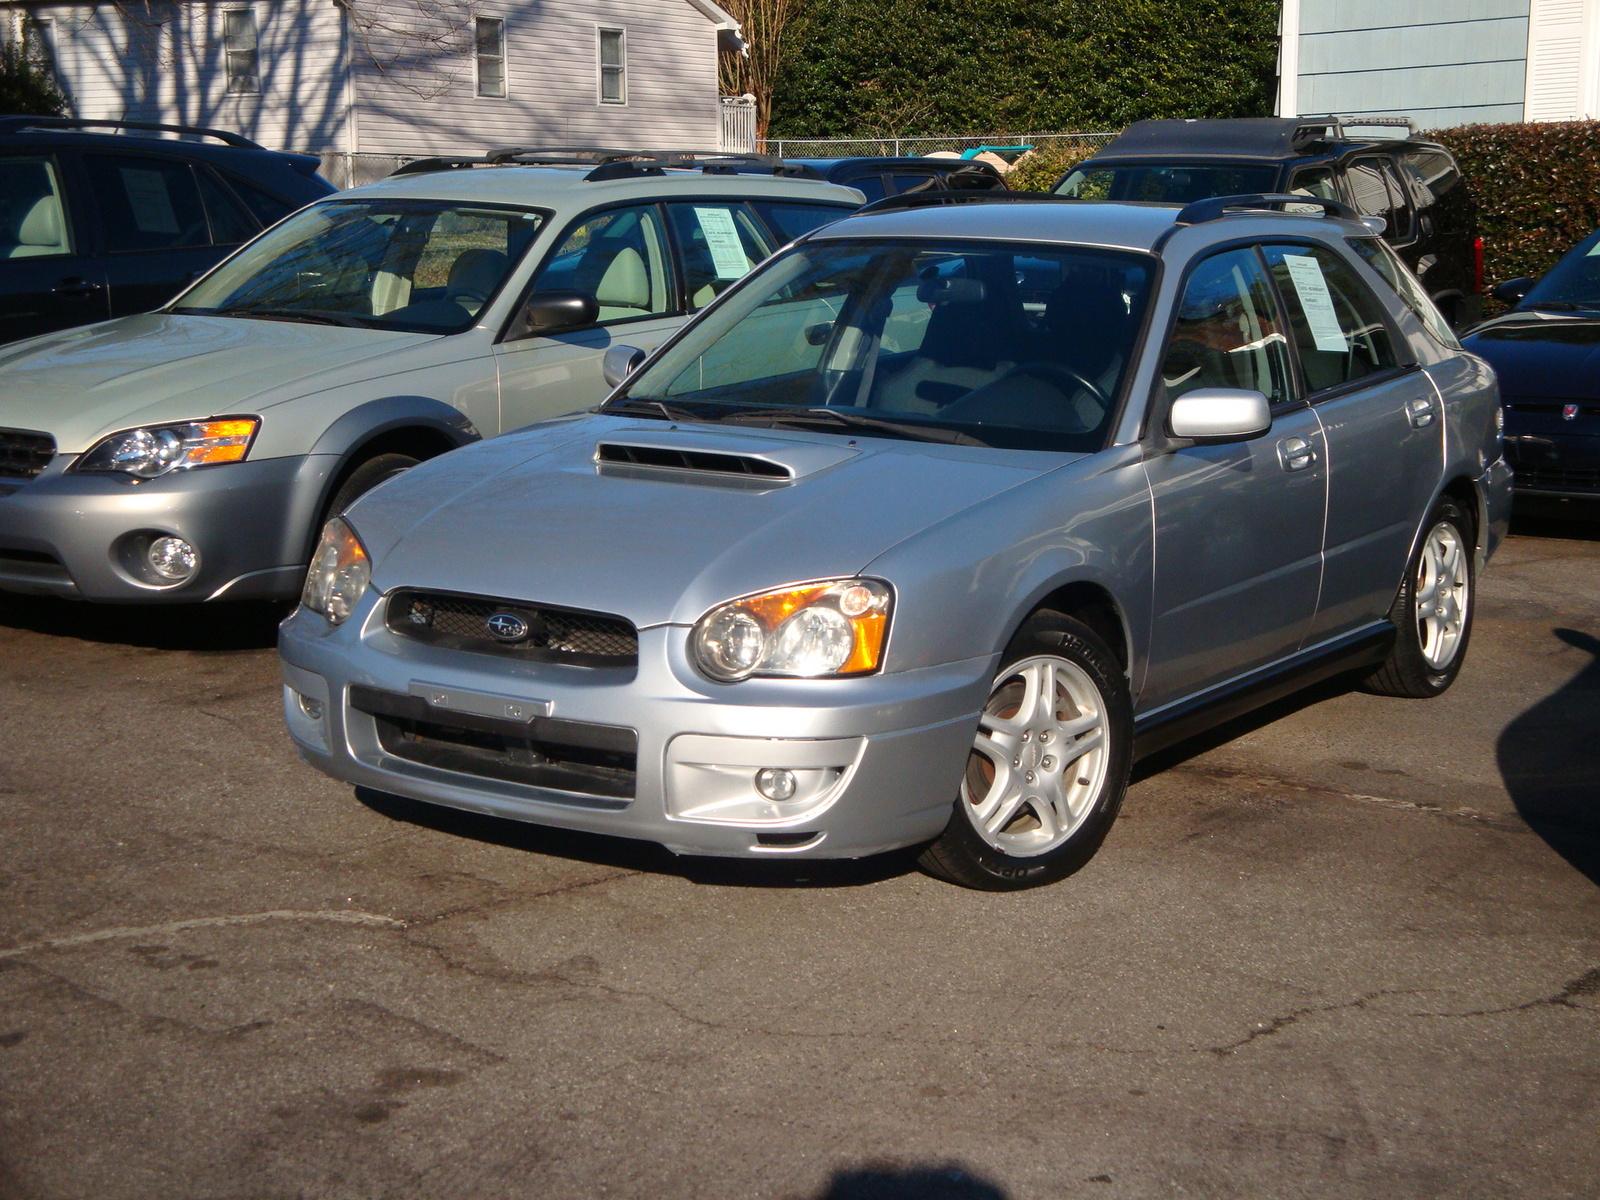 2004 Subaru Impreza Wrx Pictures Cargurus